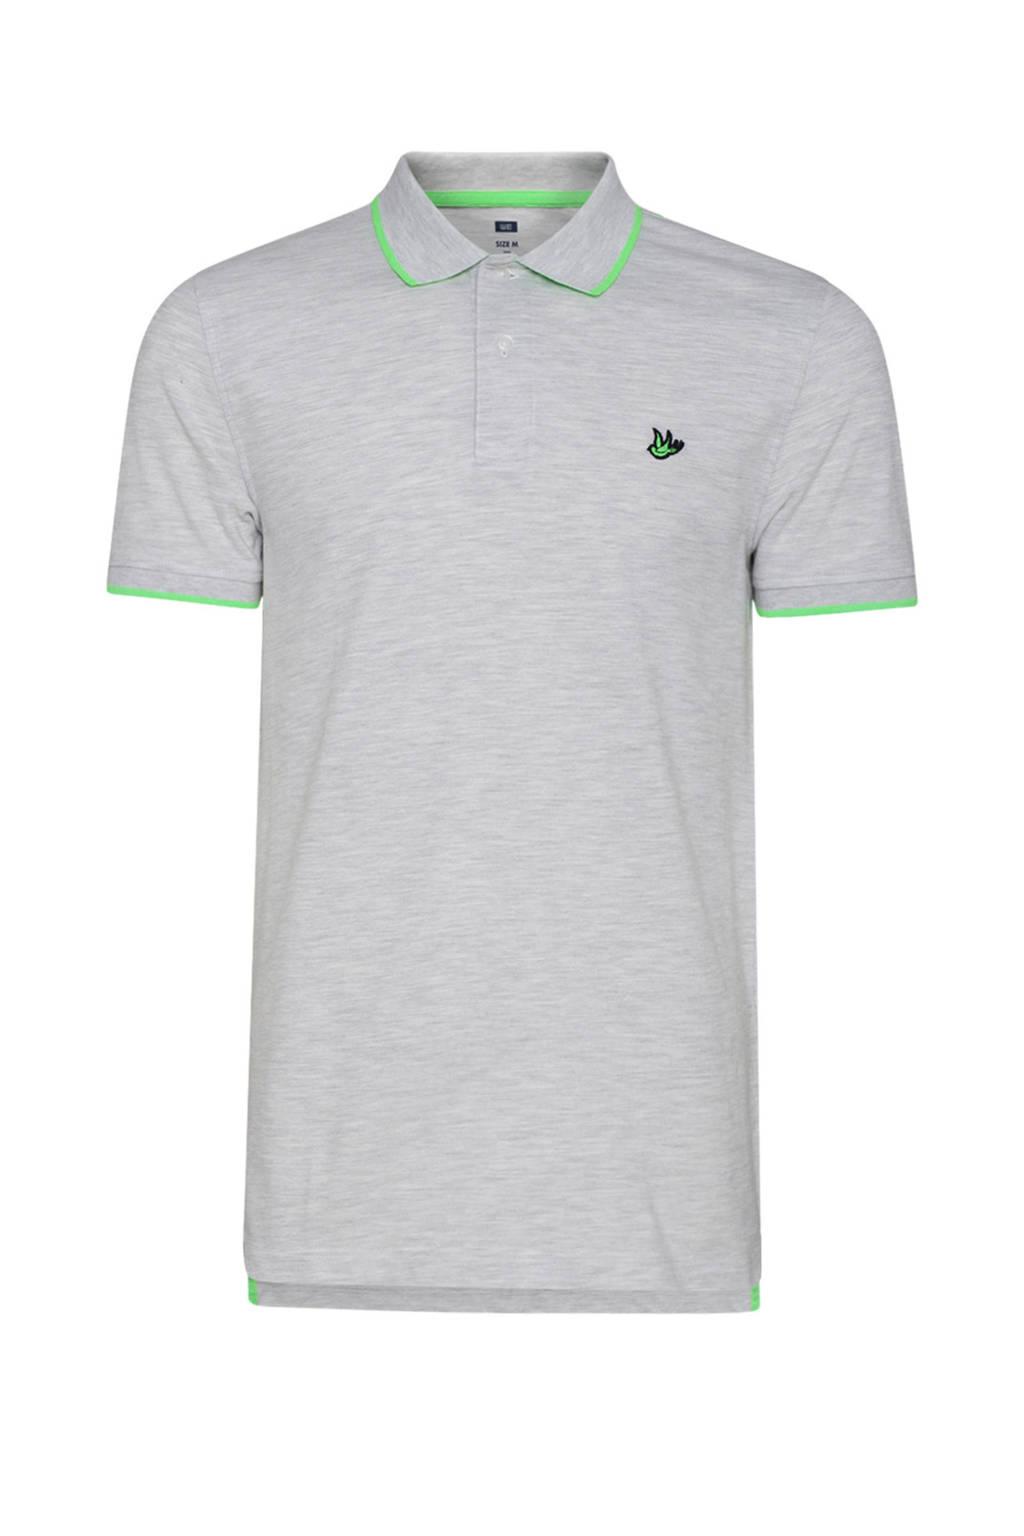 WE Fashion polo grijs, Grijs/groen